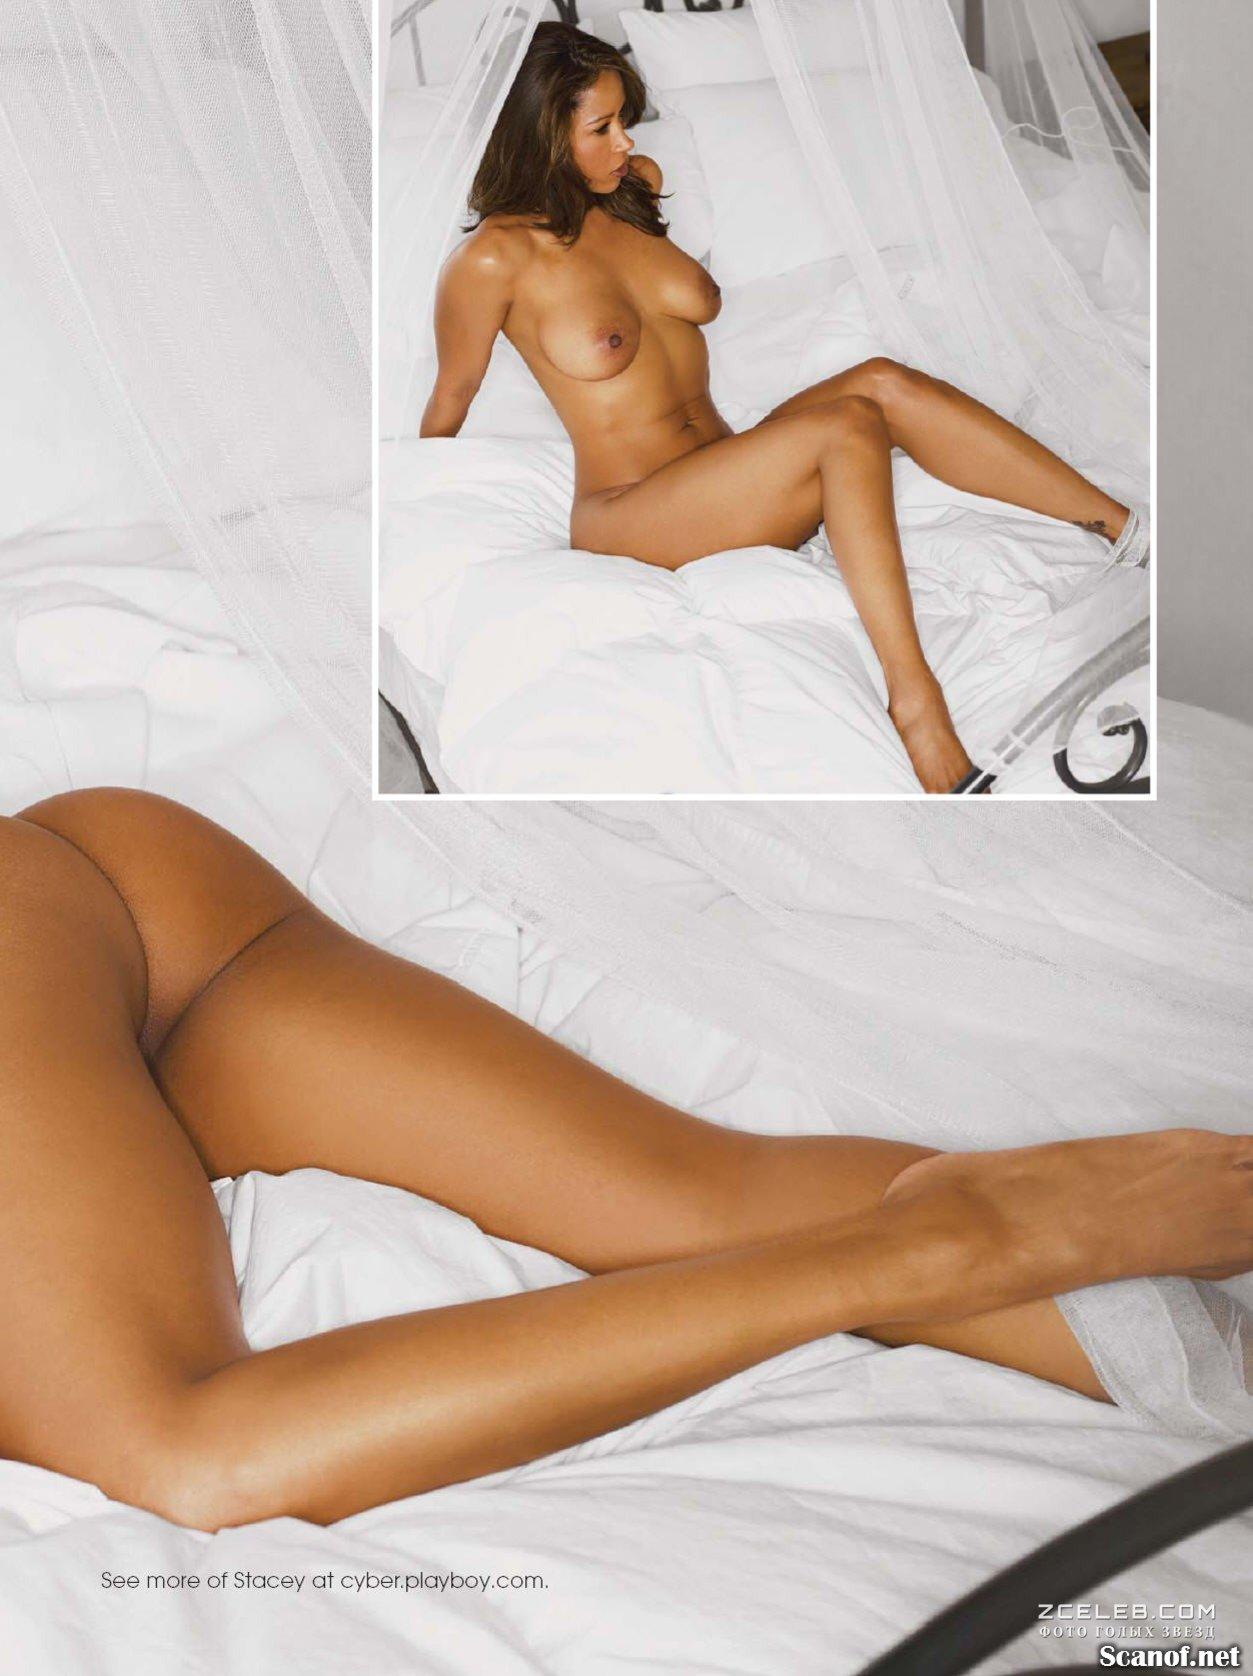 Stacey Dash Nude Playboy